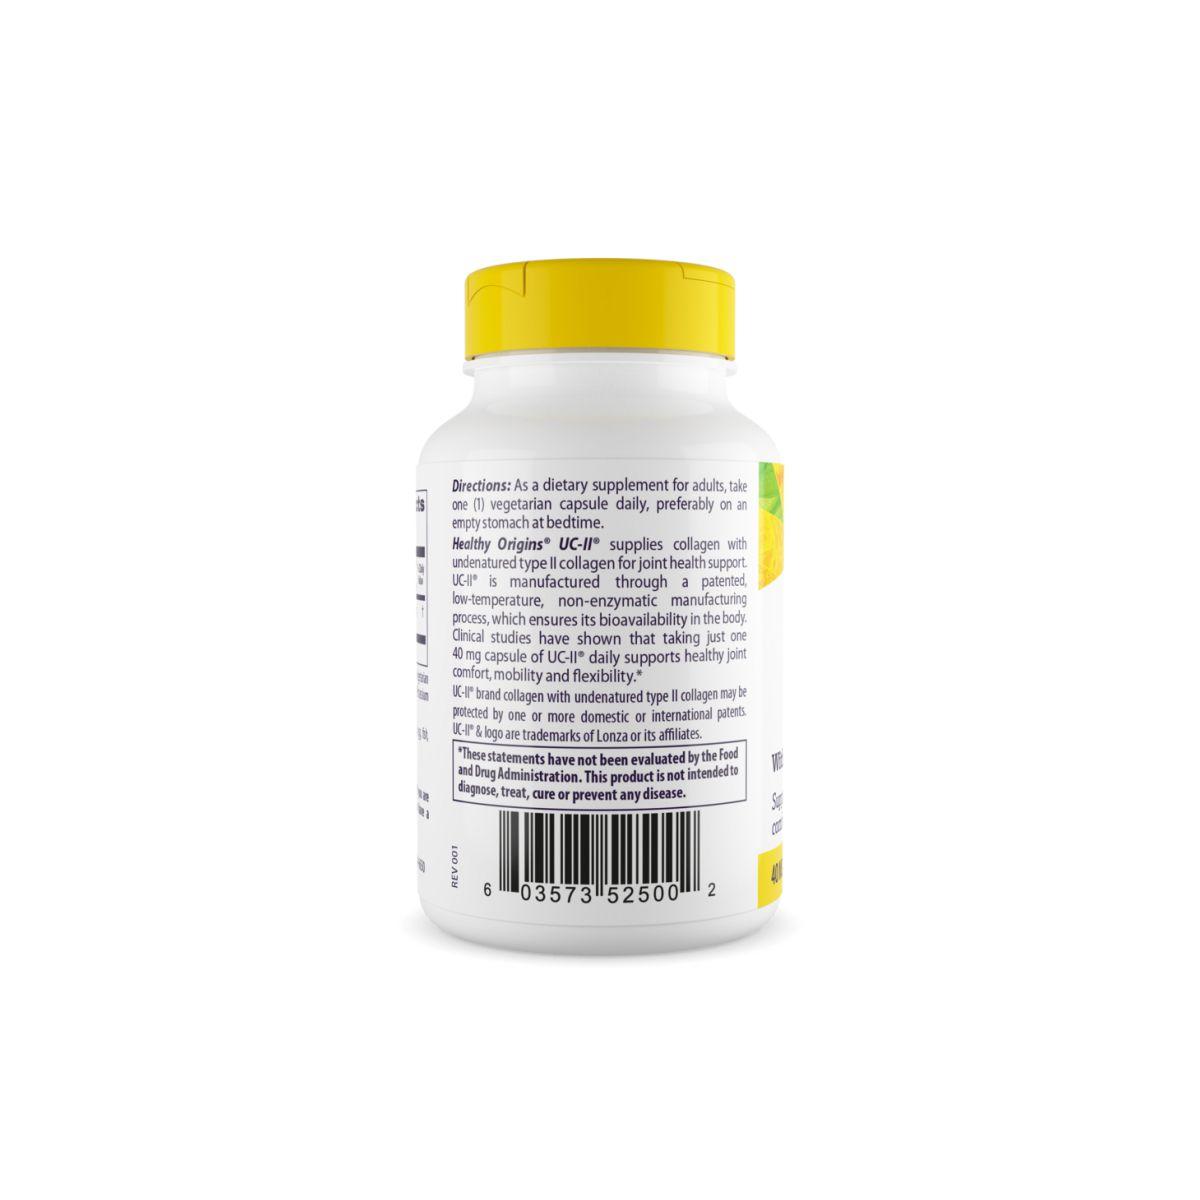 UC-II Colágeno 60 Caps - Healthy Origins